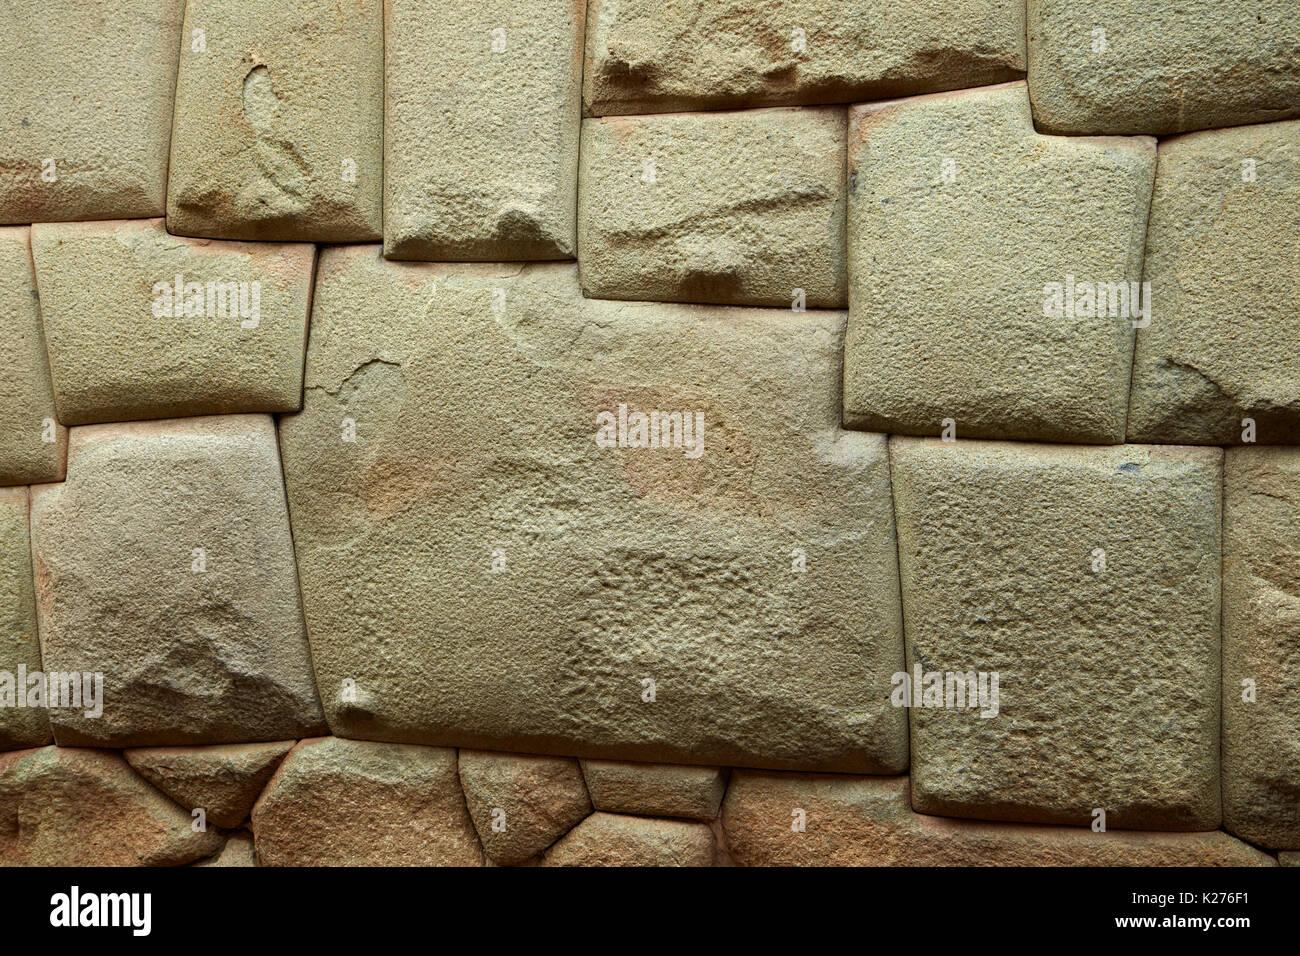 Twelve Angled Stone (historic Inca stonework), Calle Hatunrumiyoc, Cusco, Peru, South America - Stock Image